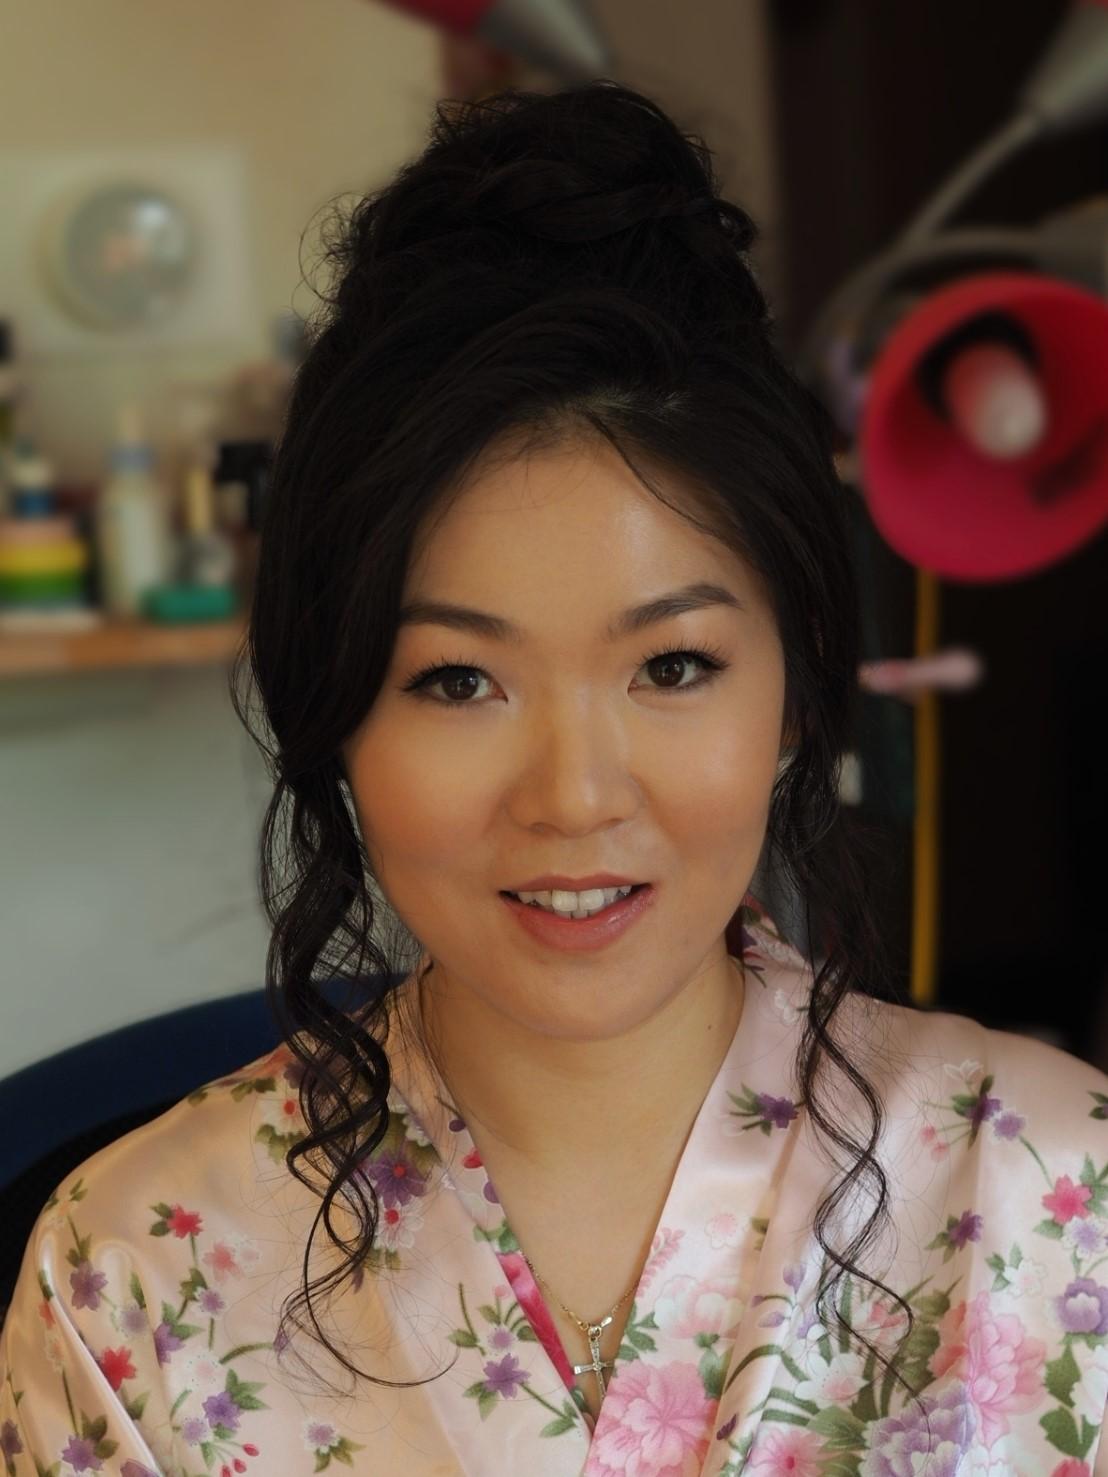 natural makeup lash extensions